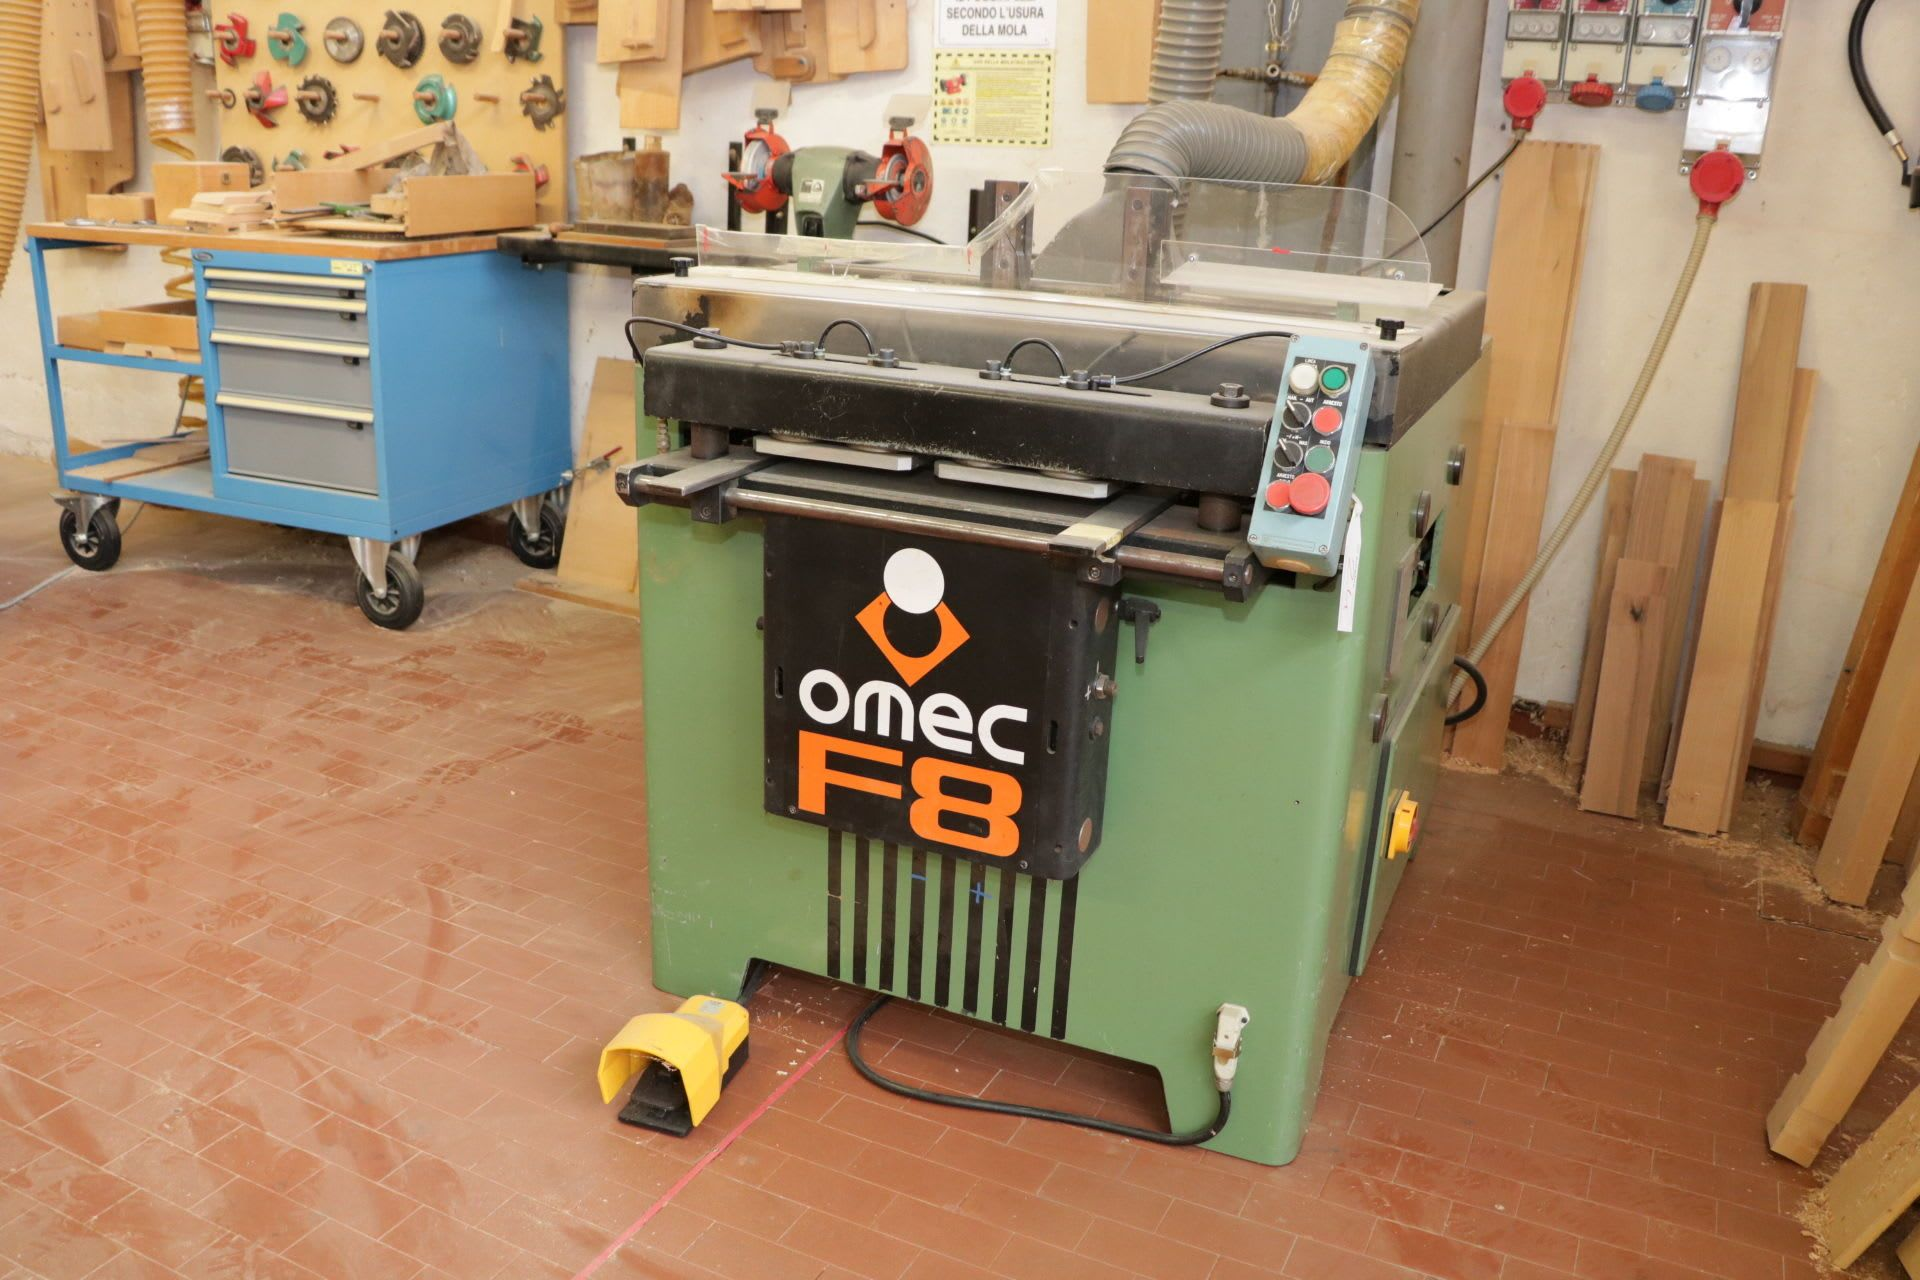 OMEC F8 Keilzinkenfräse